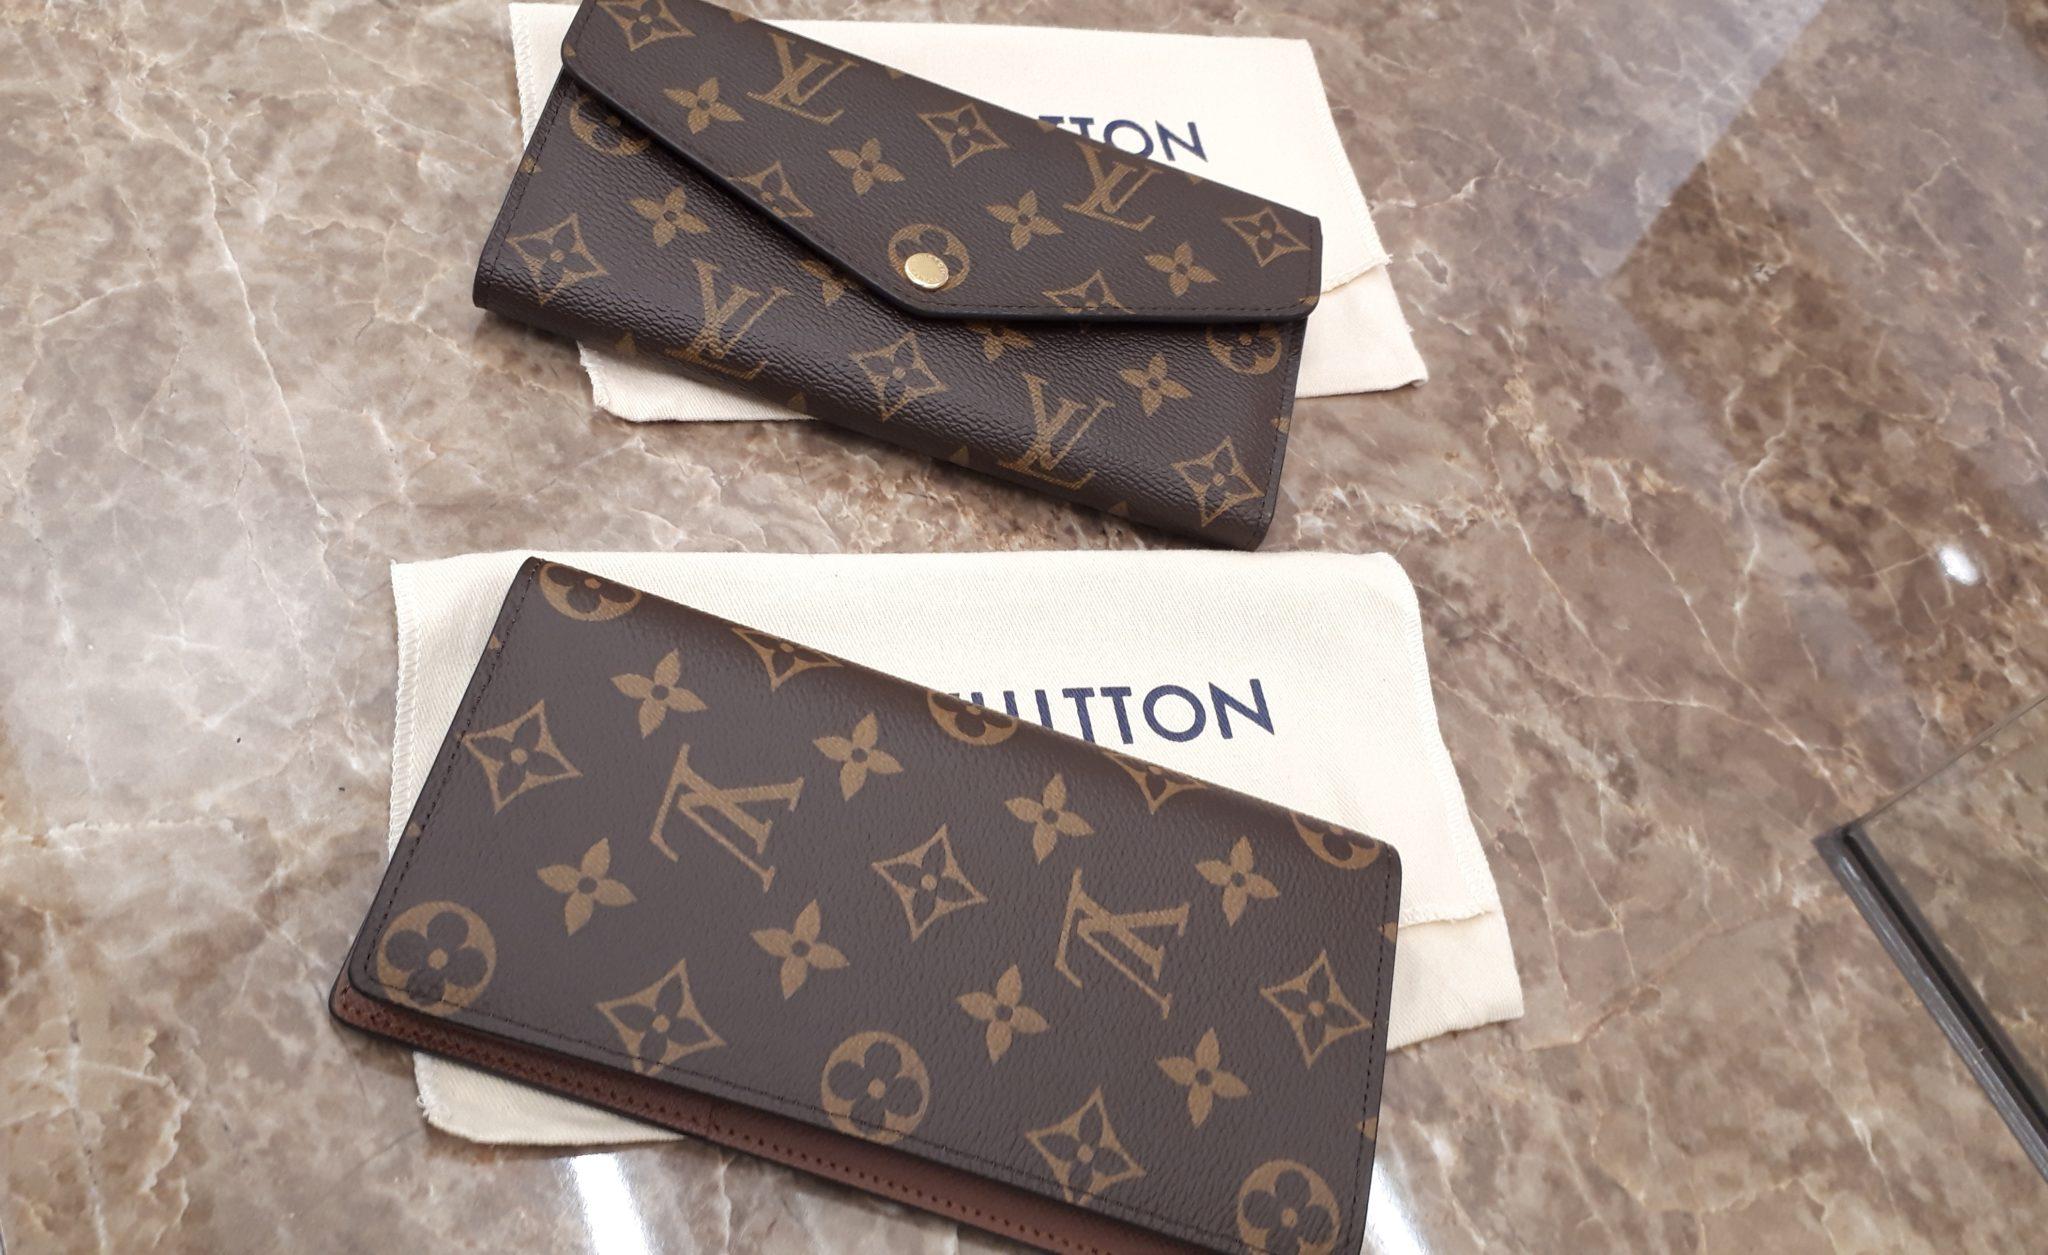 【LOUIS VUITTON ルイヴィトン モノグラム 財布】を盛岡市のお客様よりお買い取りさせていただきました!